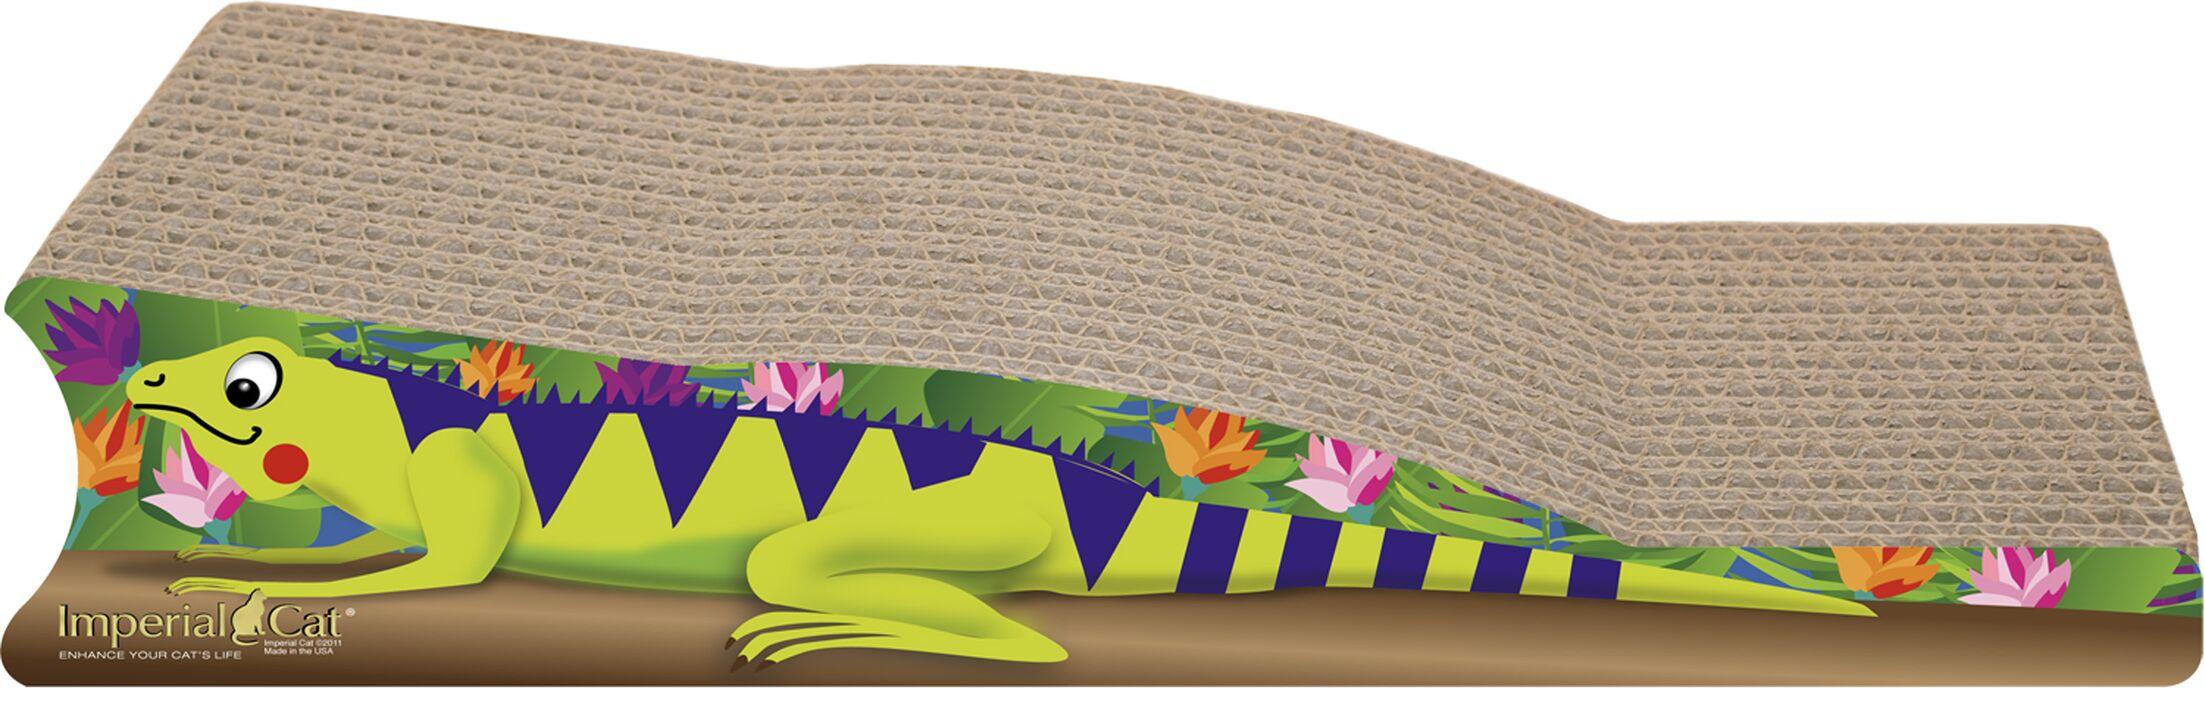 Scratch 'n Shapes Medium Iguana Recycled Paper Scratching Board